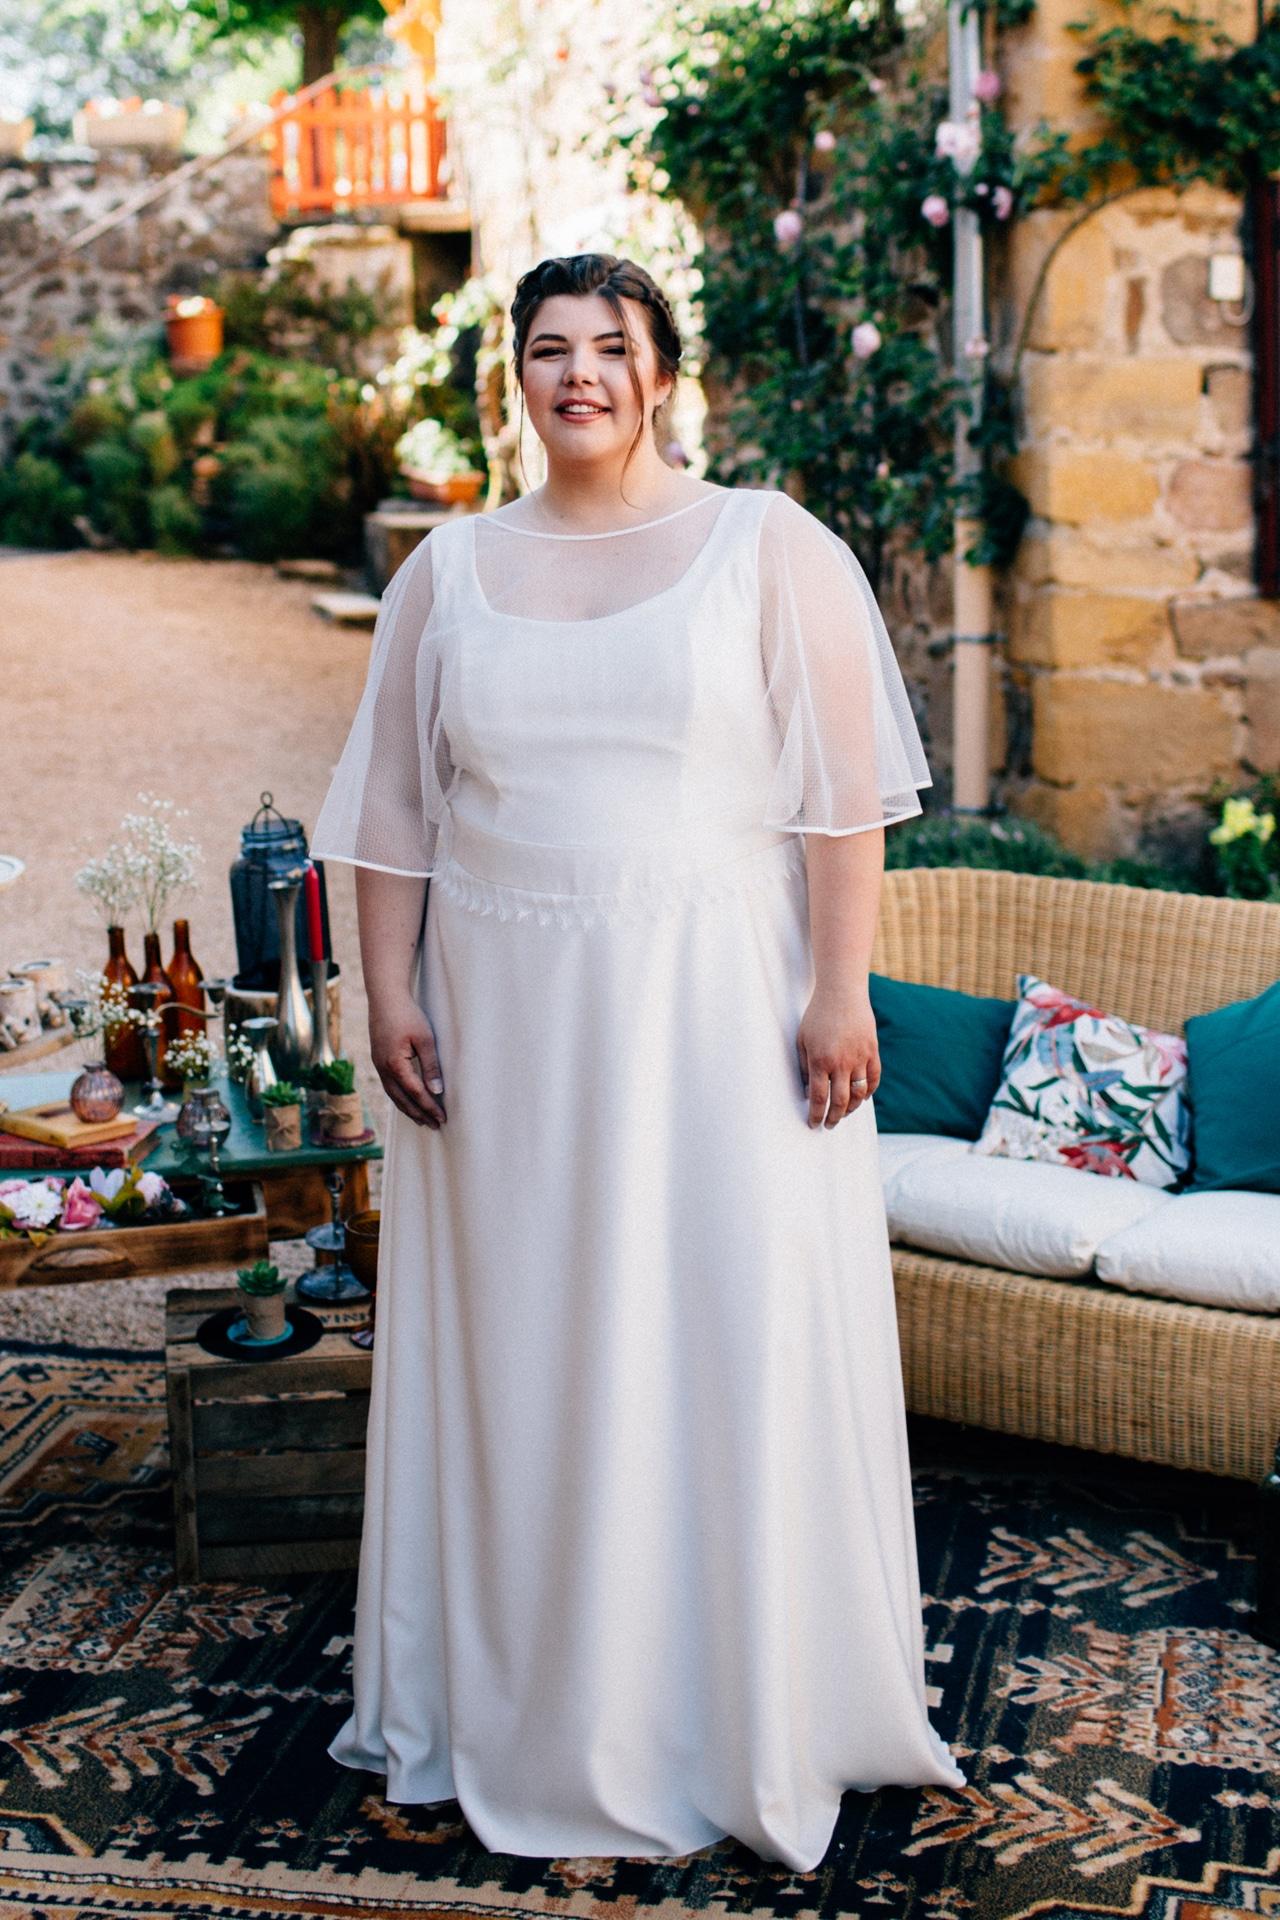 Collection De Robe De Mariée Grande Taille Causons Mariage